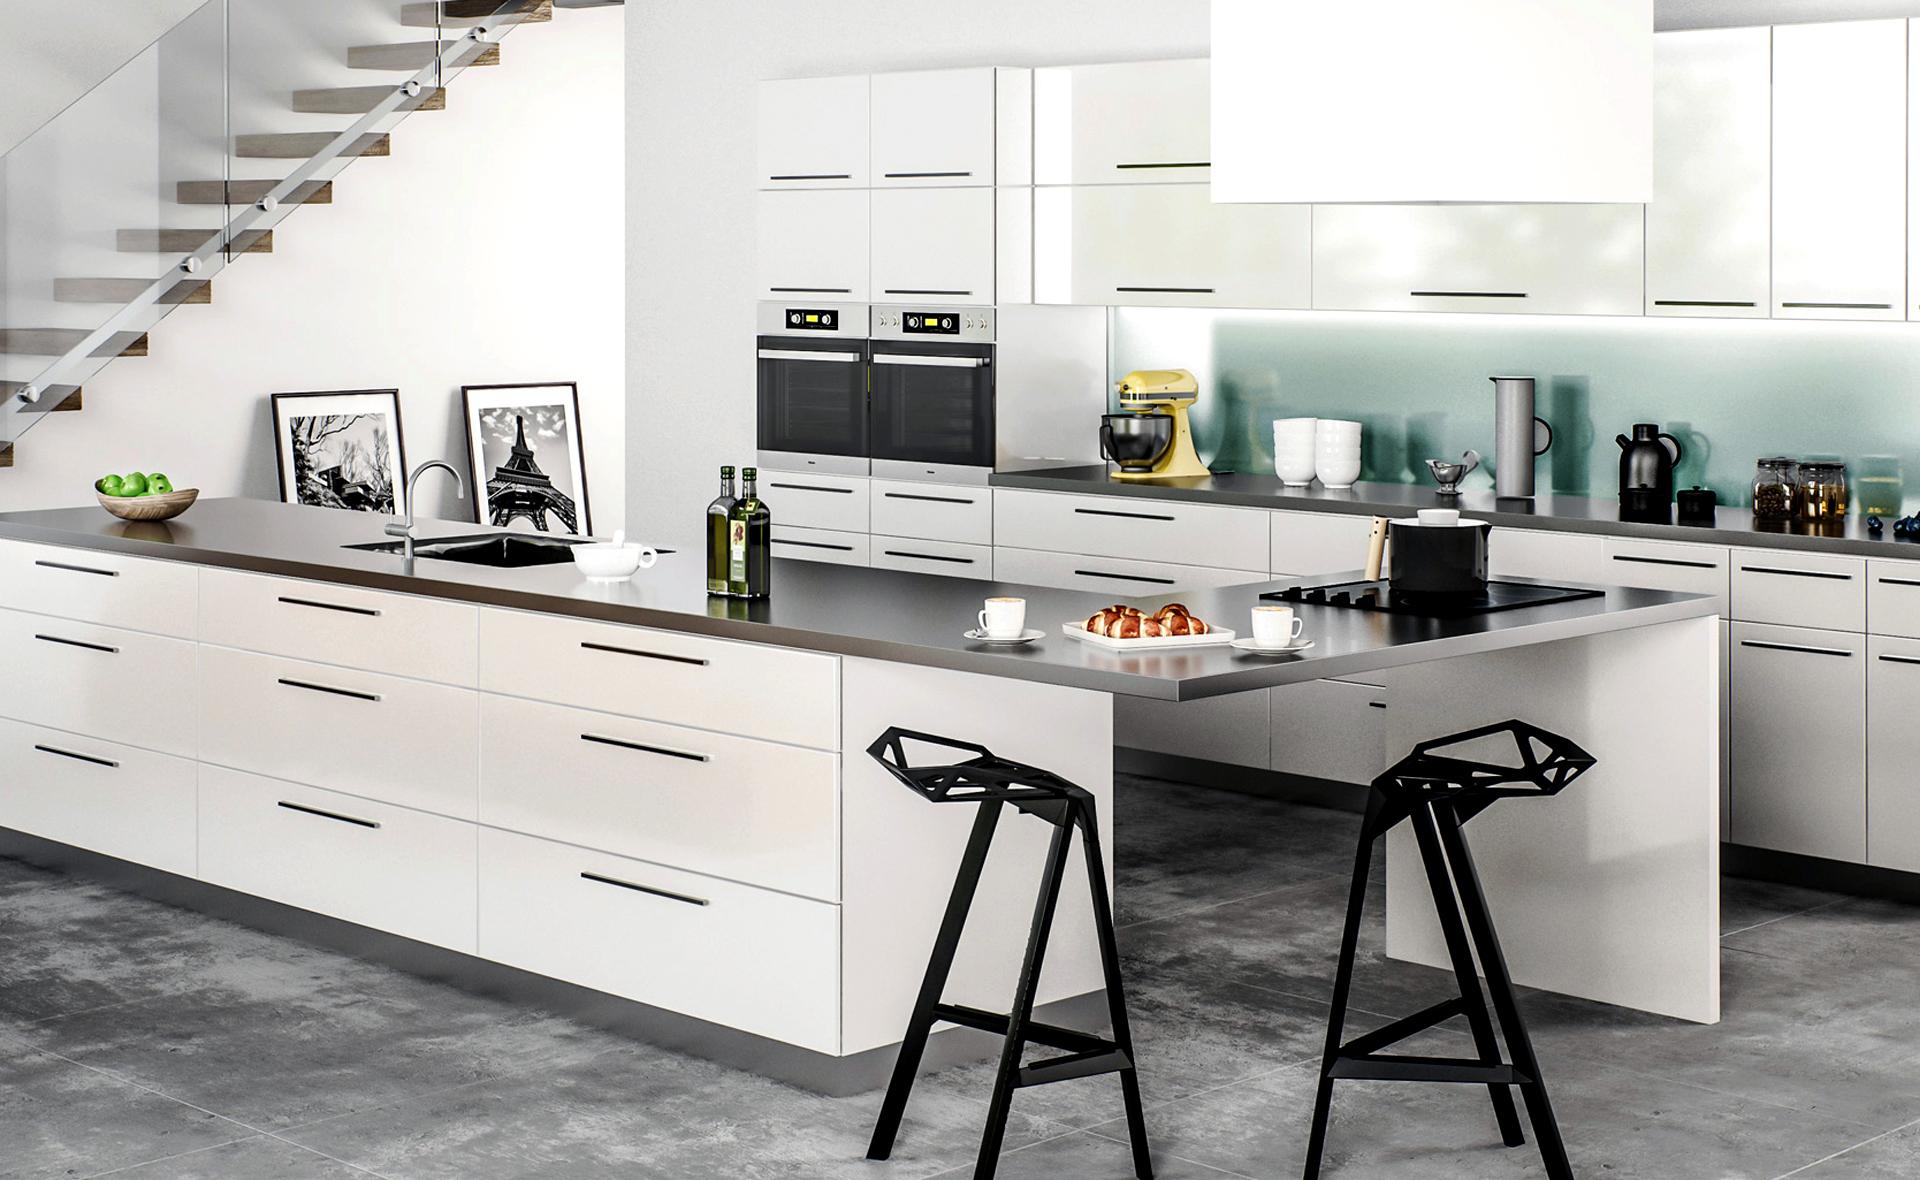 kitchen-renovations-in-morris-county-nj